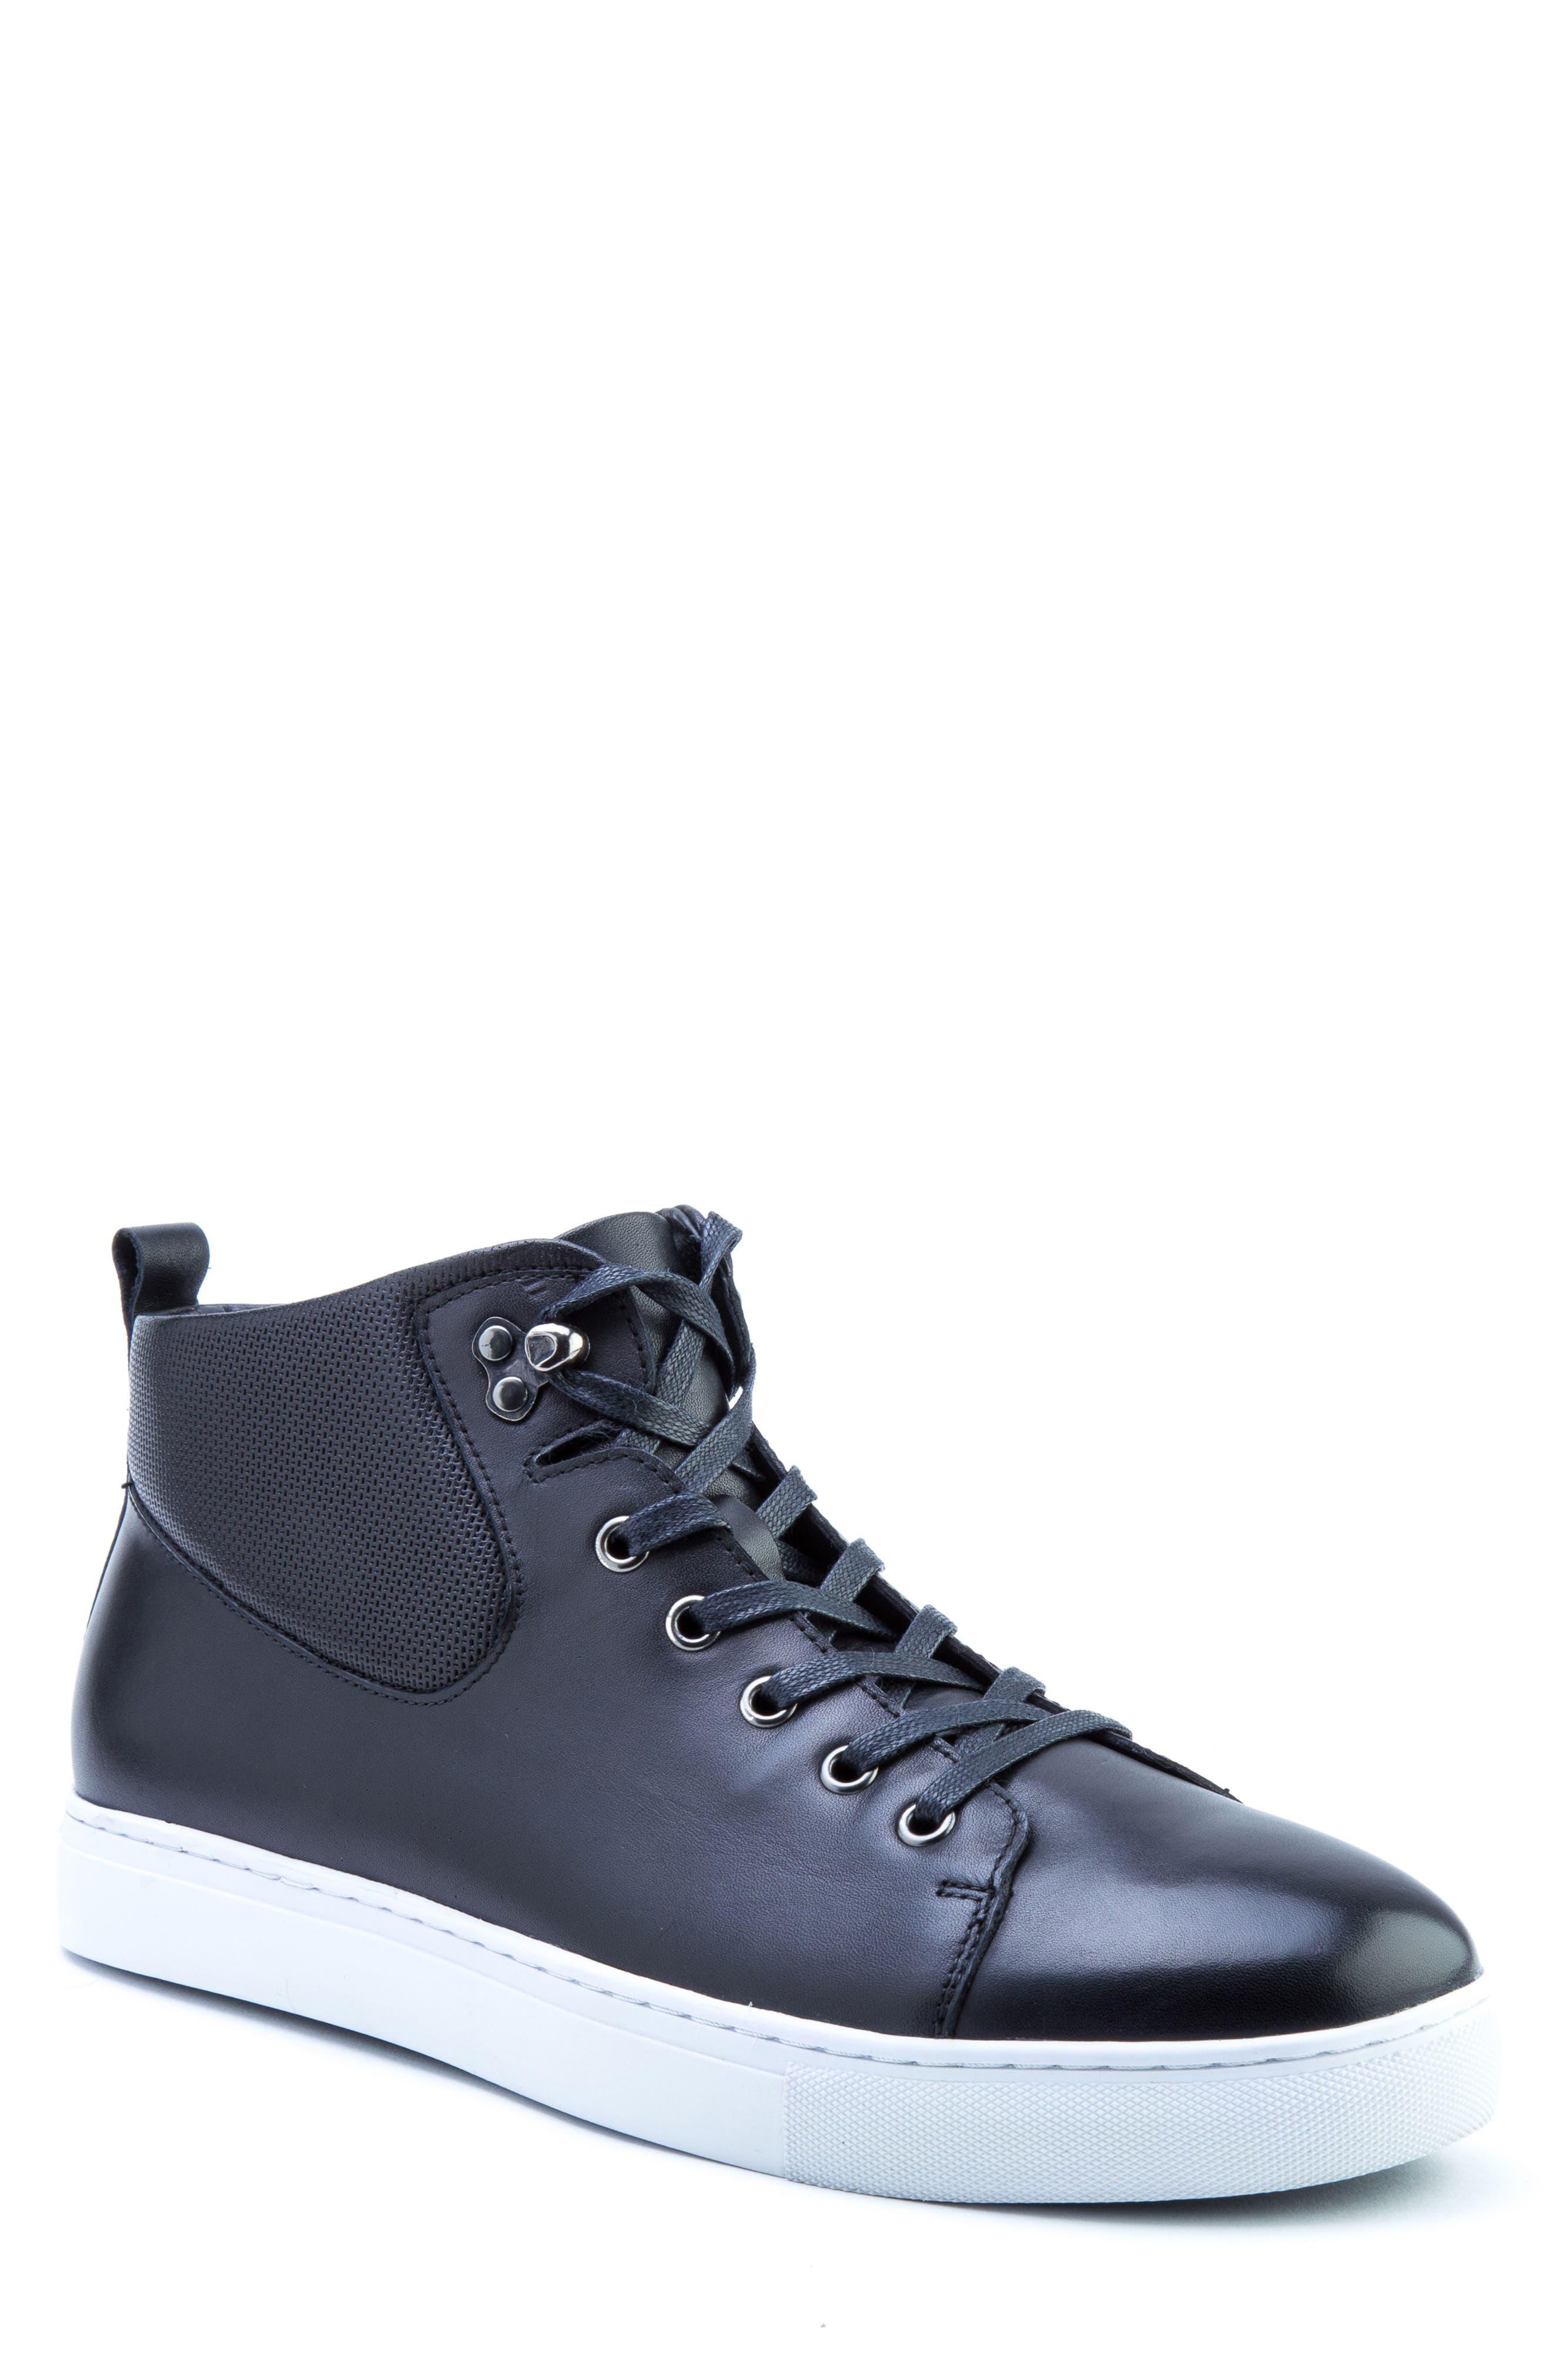 Sanders Sneaker,                             Main thumbnail 1, color,                             Black Leather